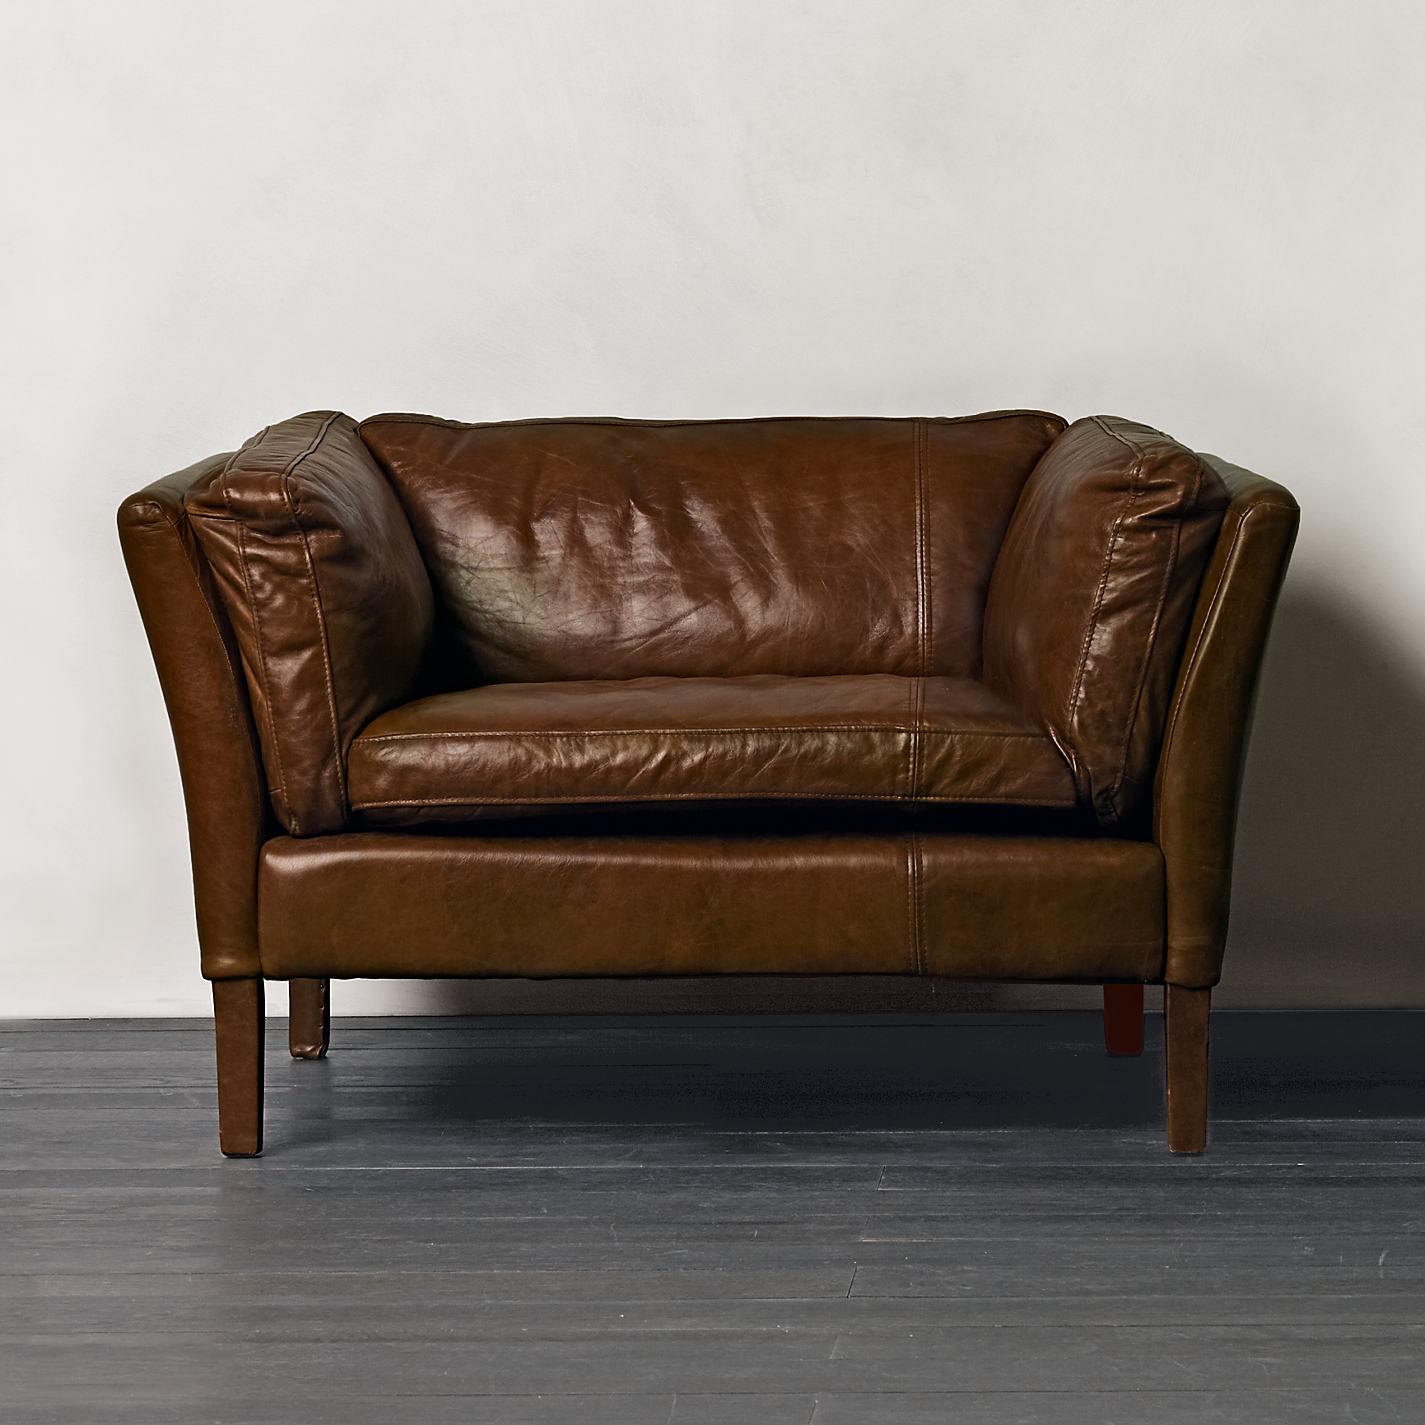 Buy Halo Groucho Aniline Leather Armchair